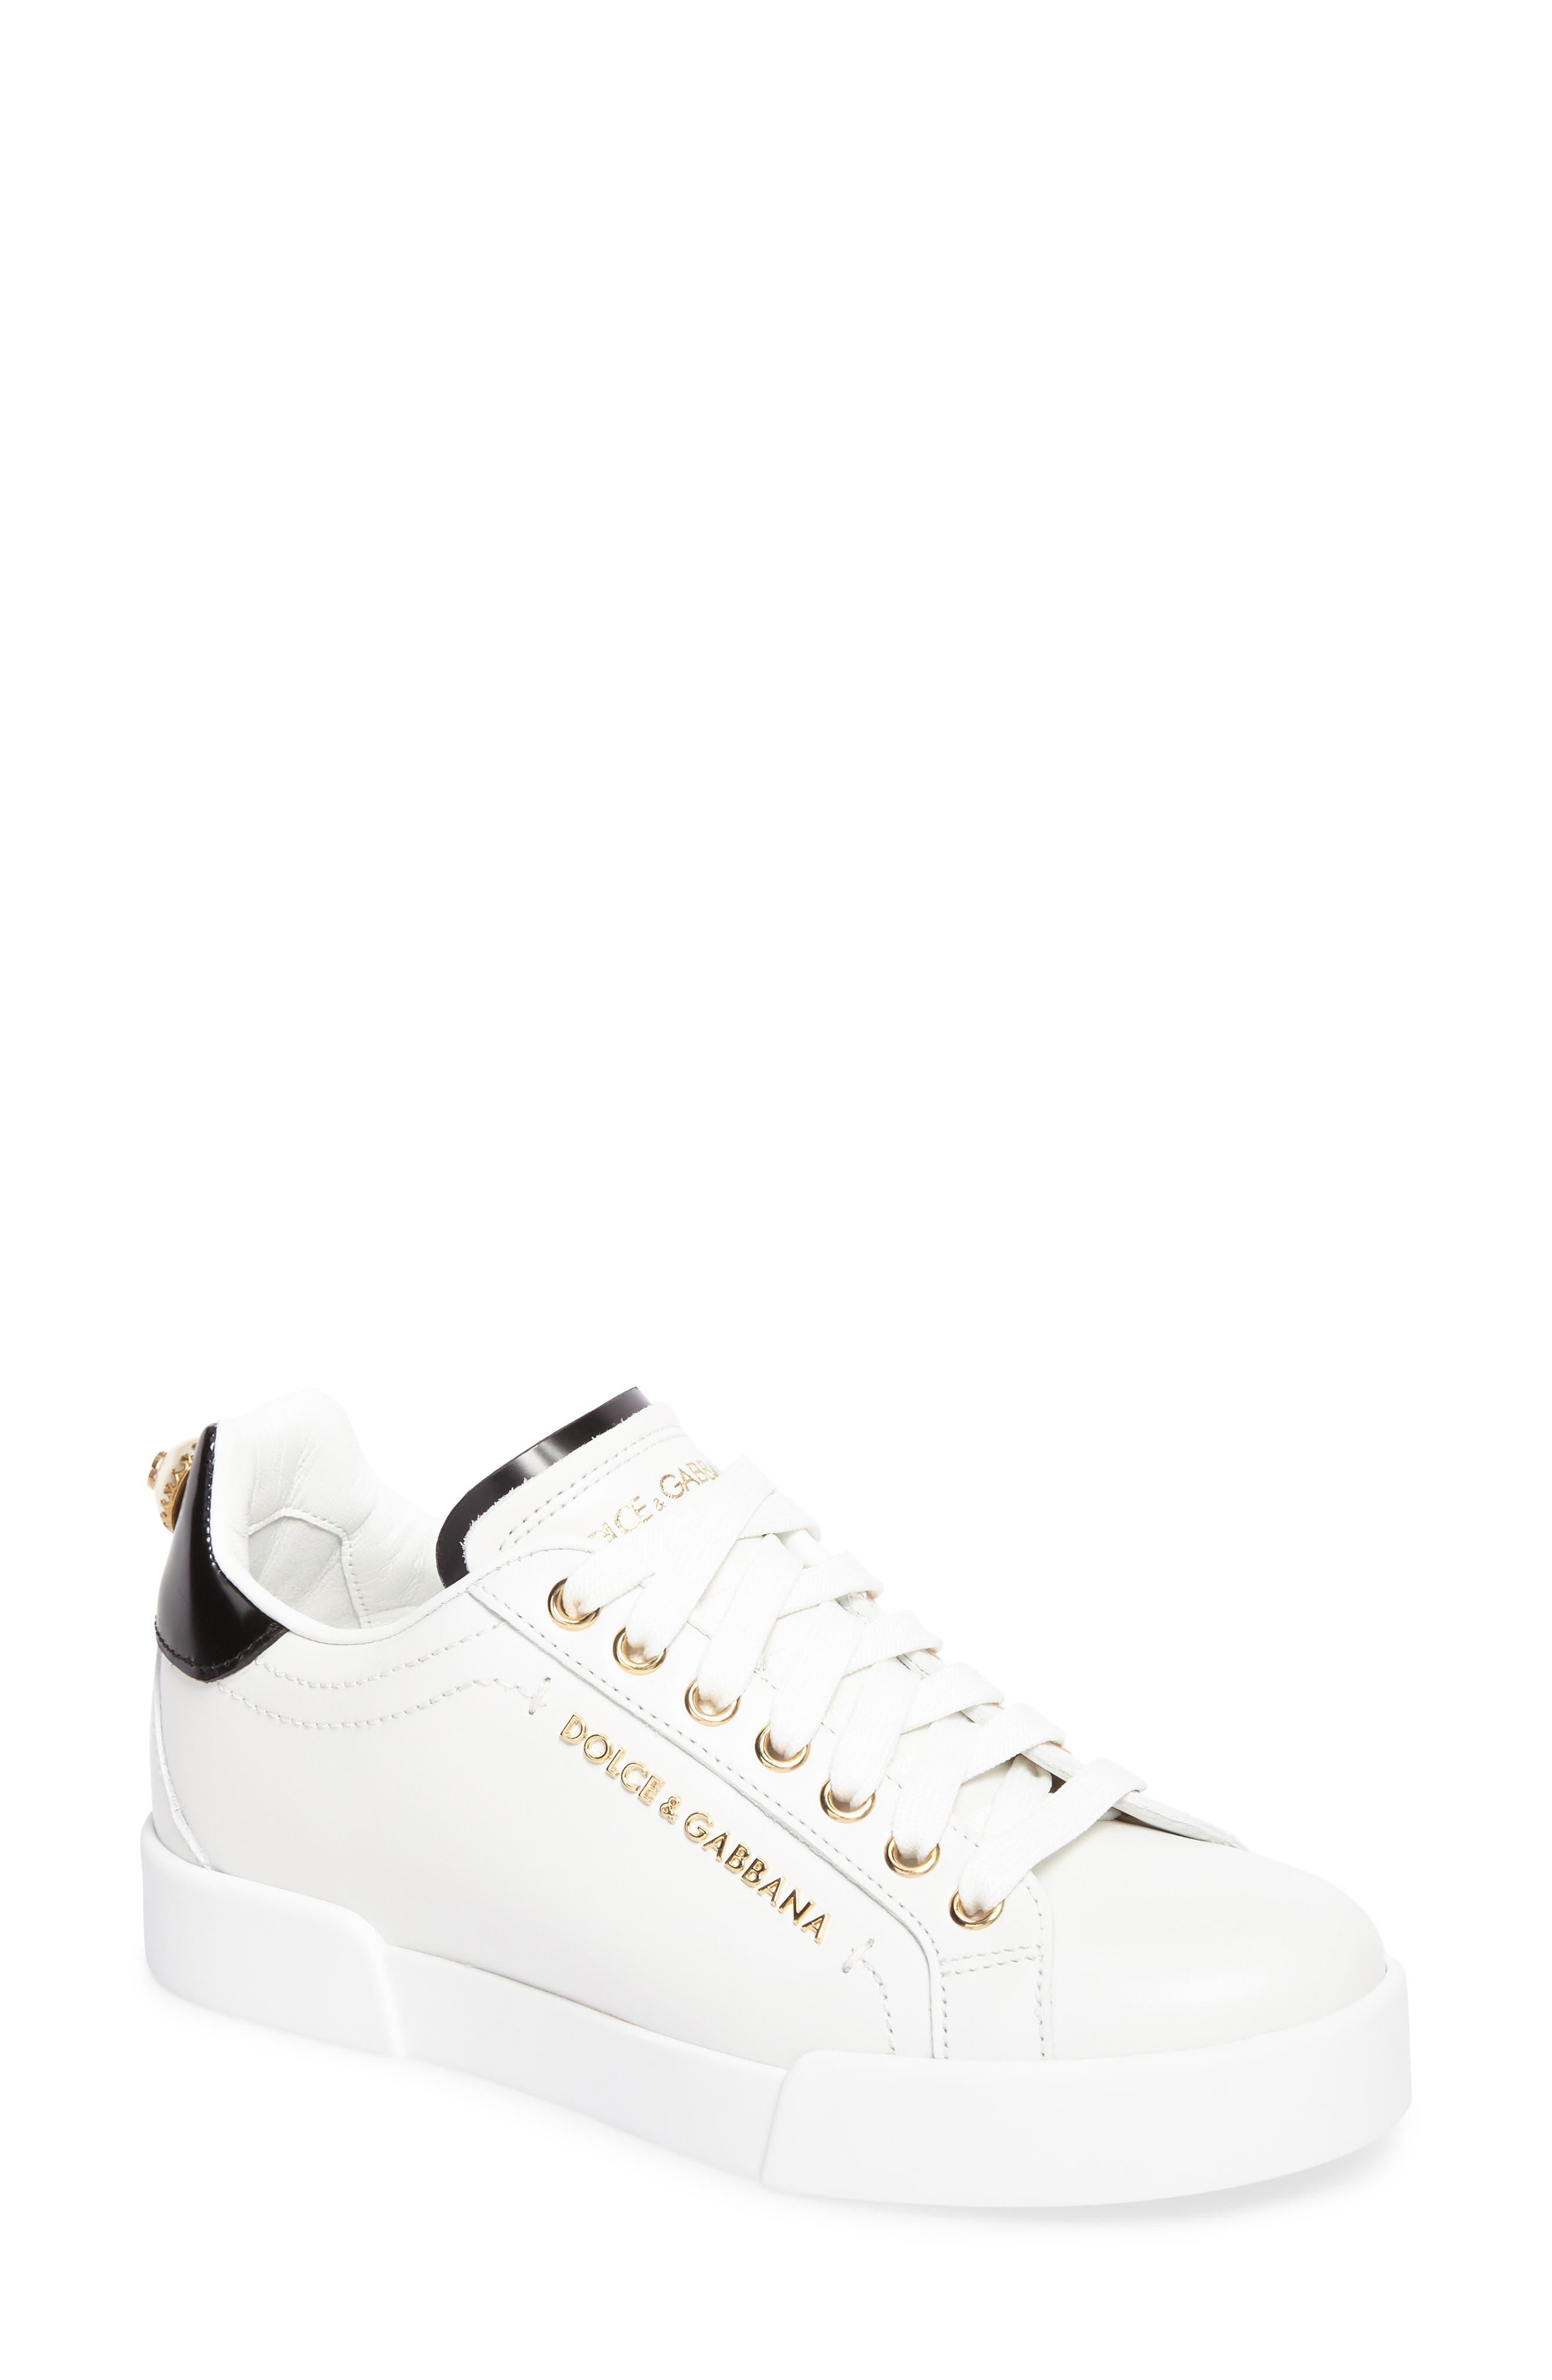 Alternate Image 1 Selected - Dolce&Gabbana Logo Embellished Sneaker (Women)